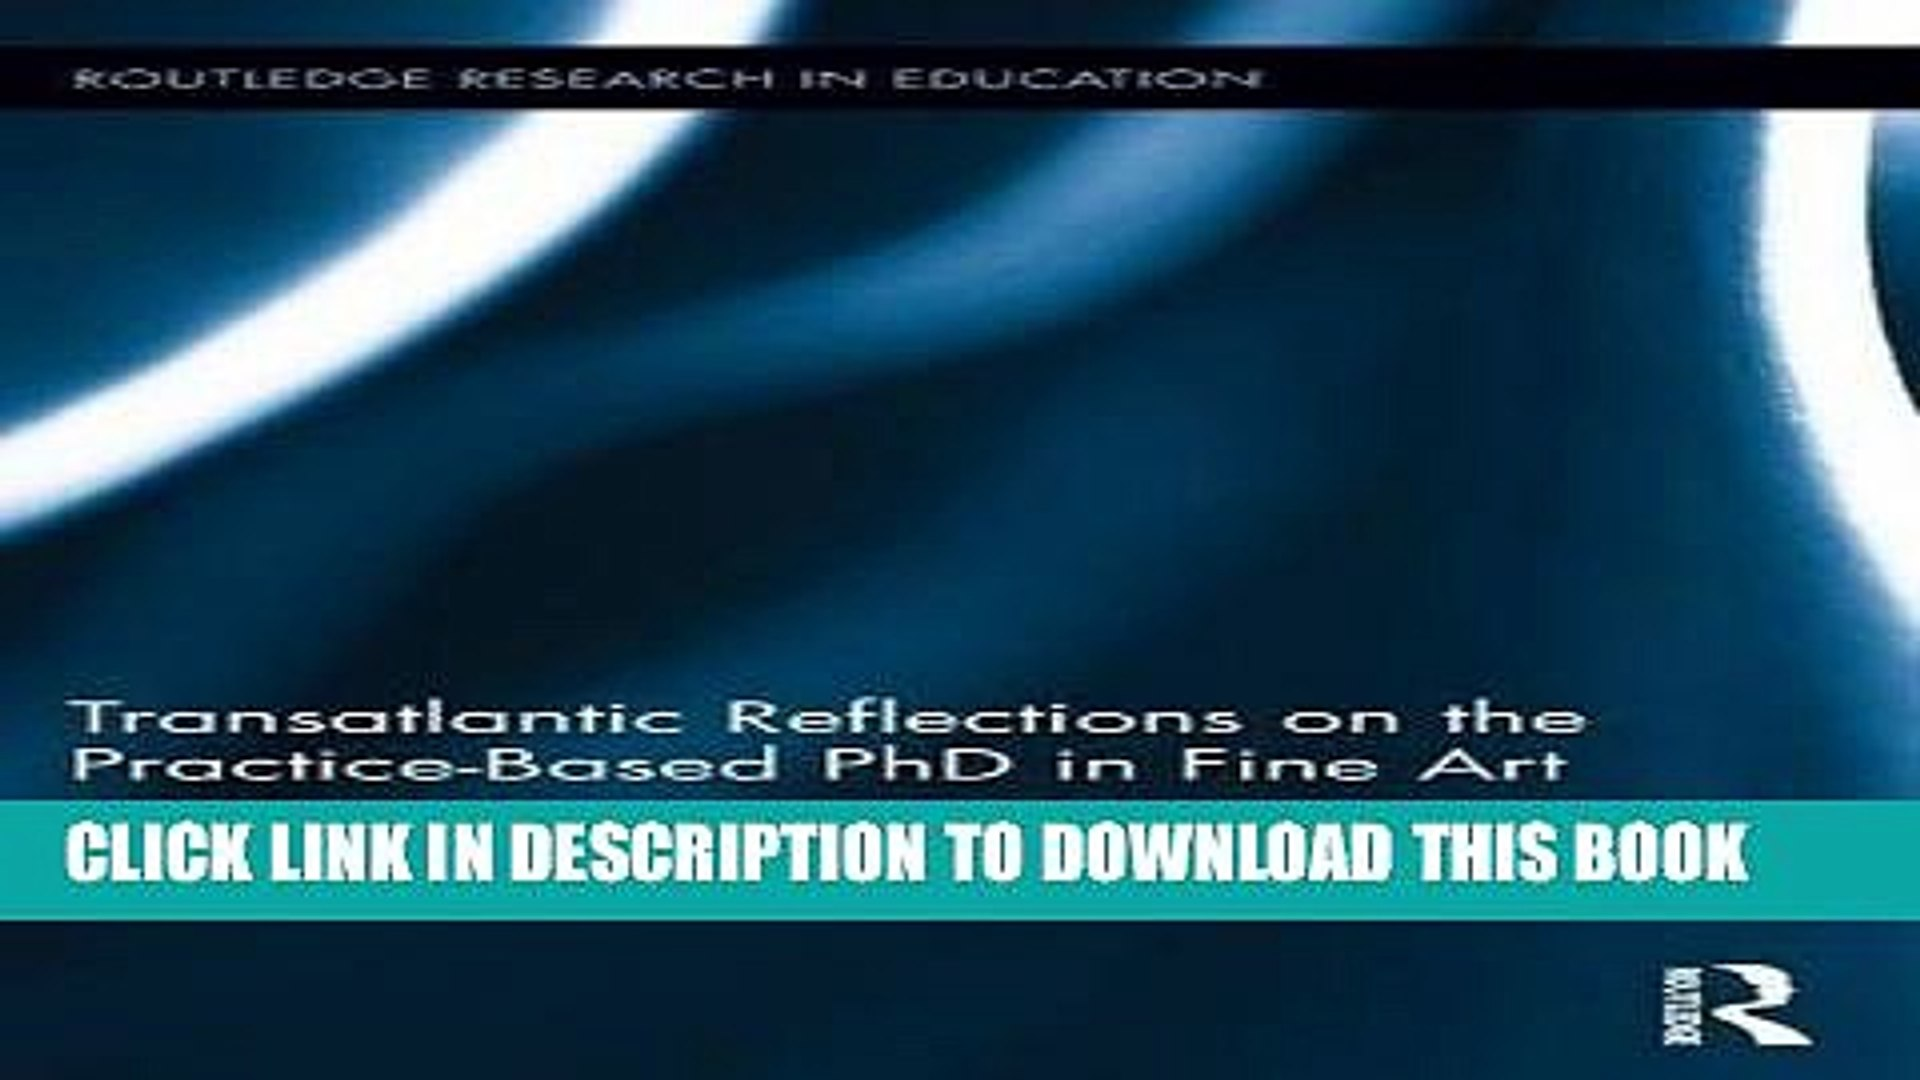 Transatlantic Reflections on the Practice-Based PhD in Fine Art